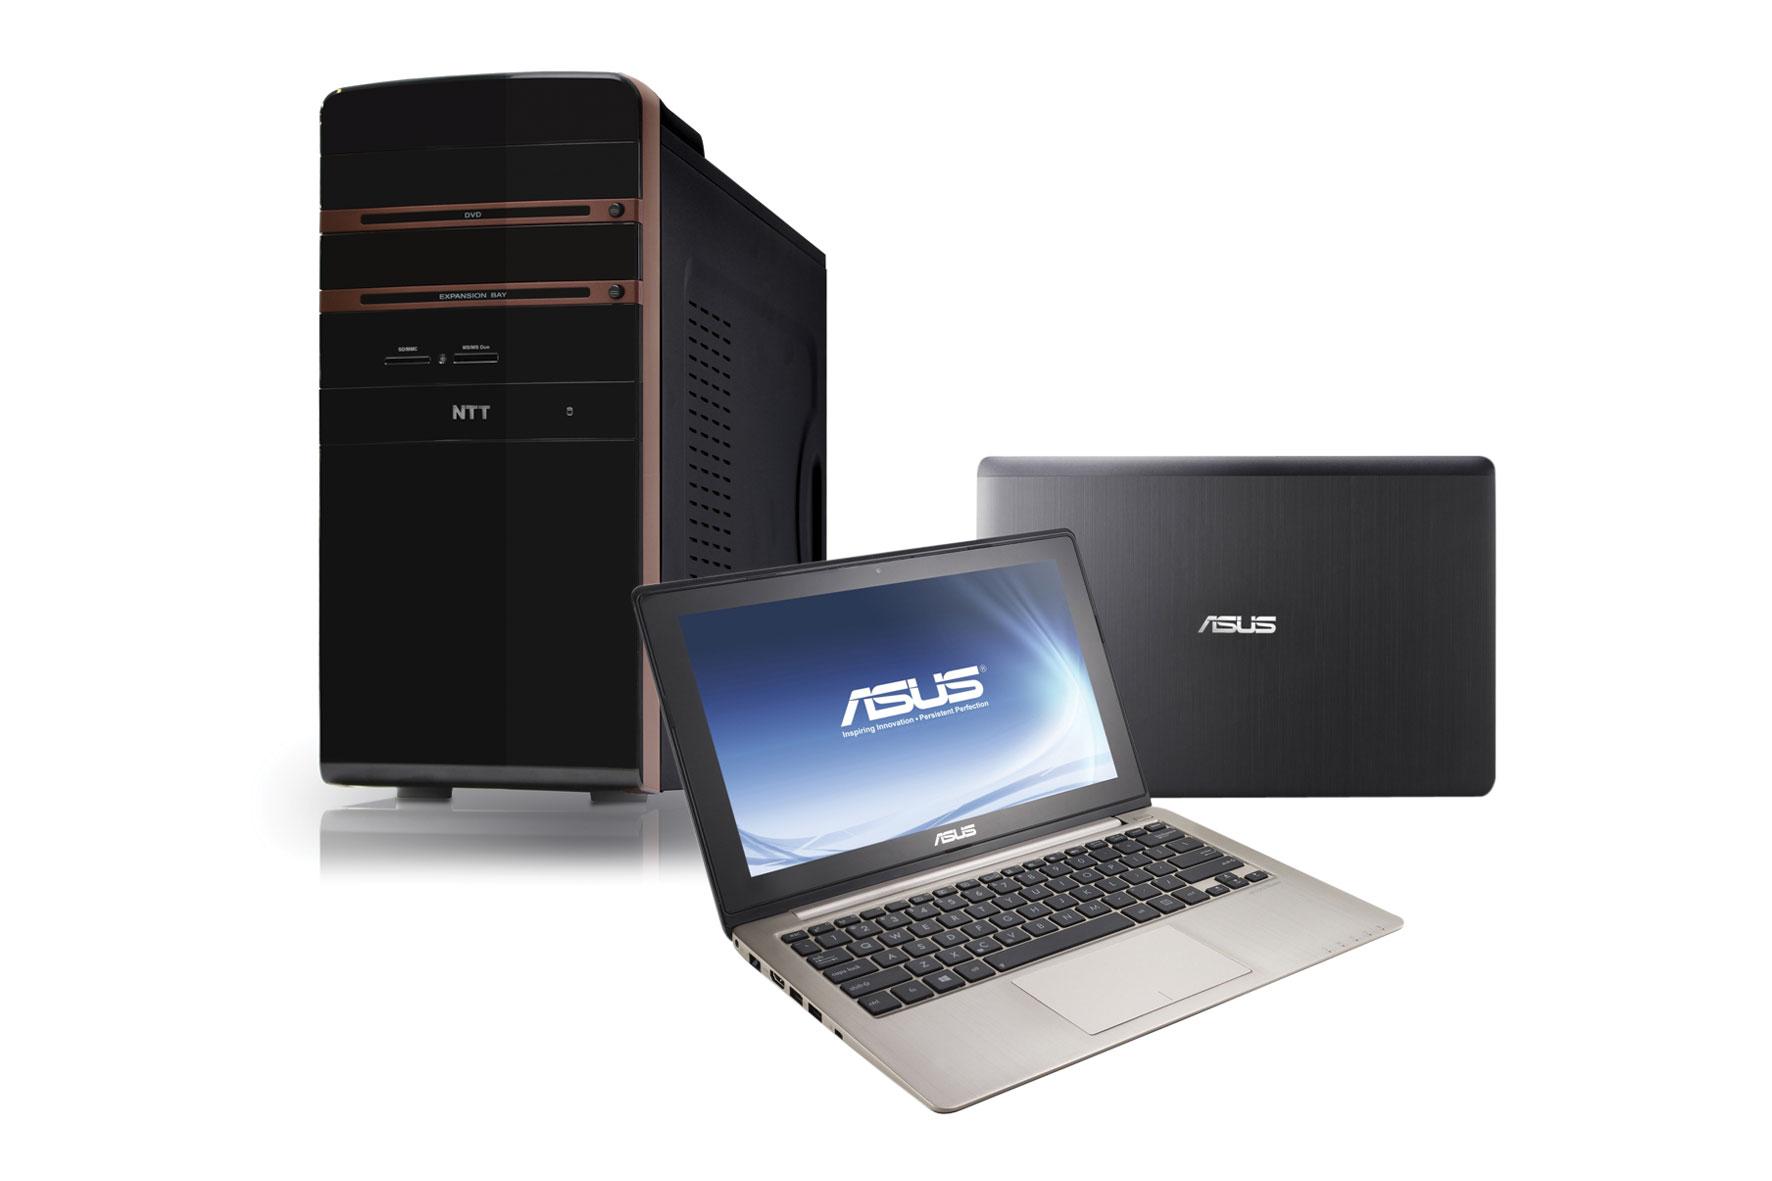 Ile komputerów za pensję?